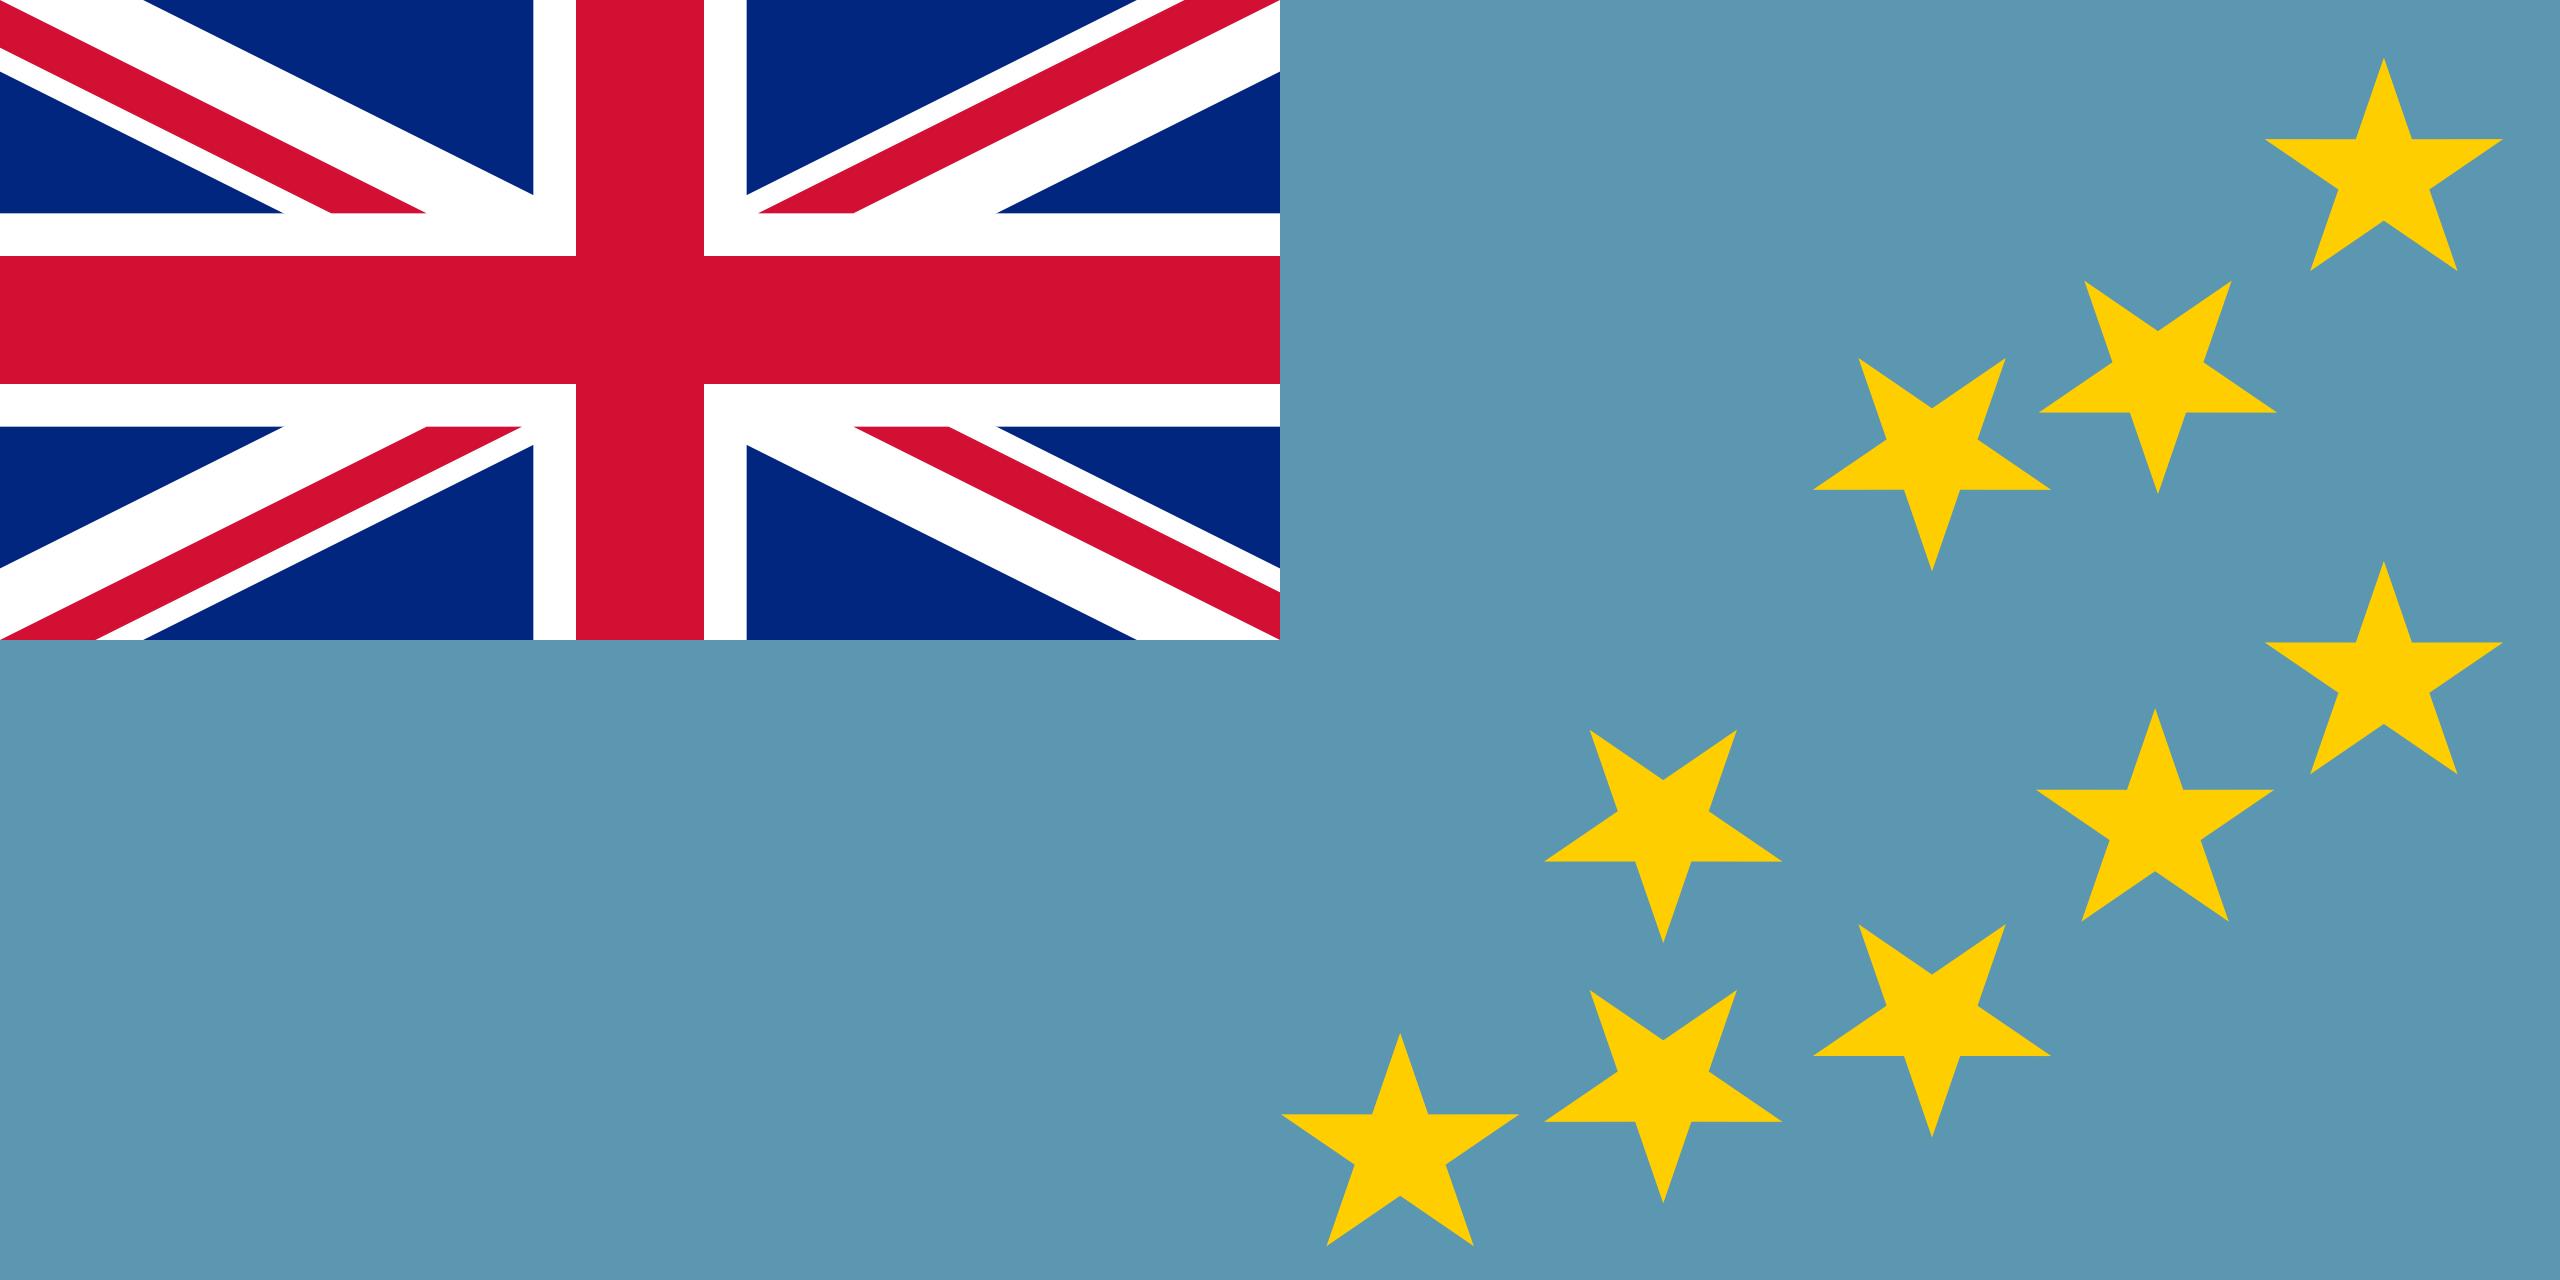 Tuvalu, pays, emblème, logo, symbole - Fonds d'écran HD - Professor-falken.com